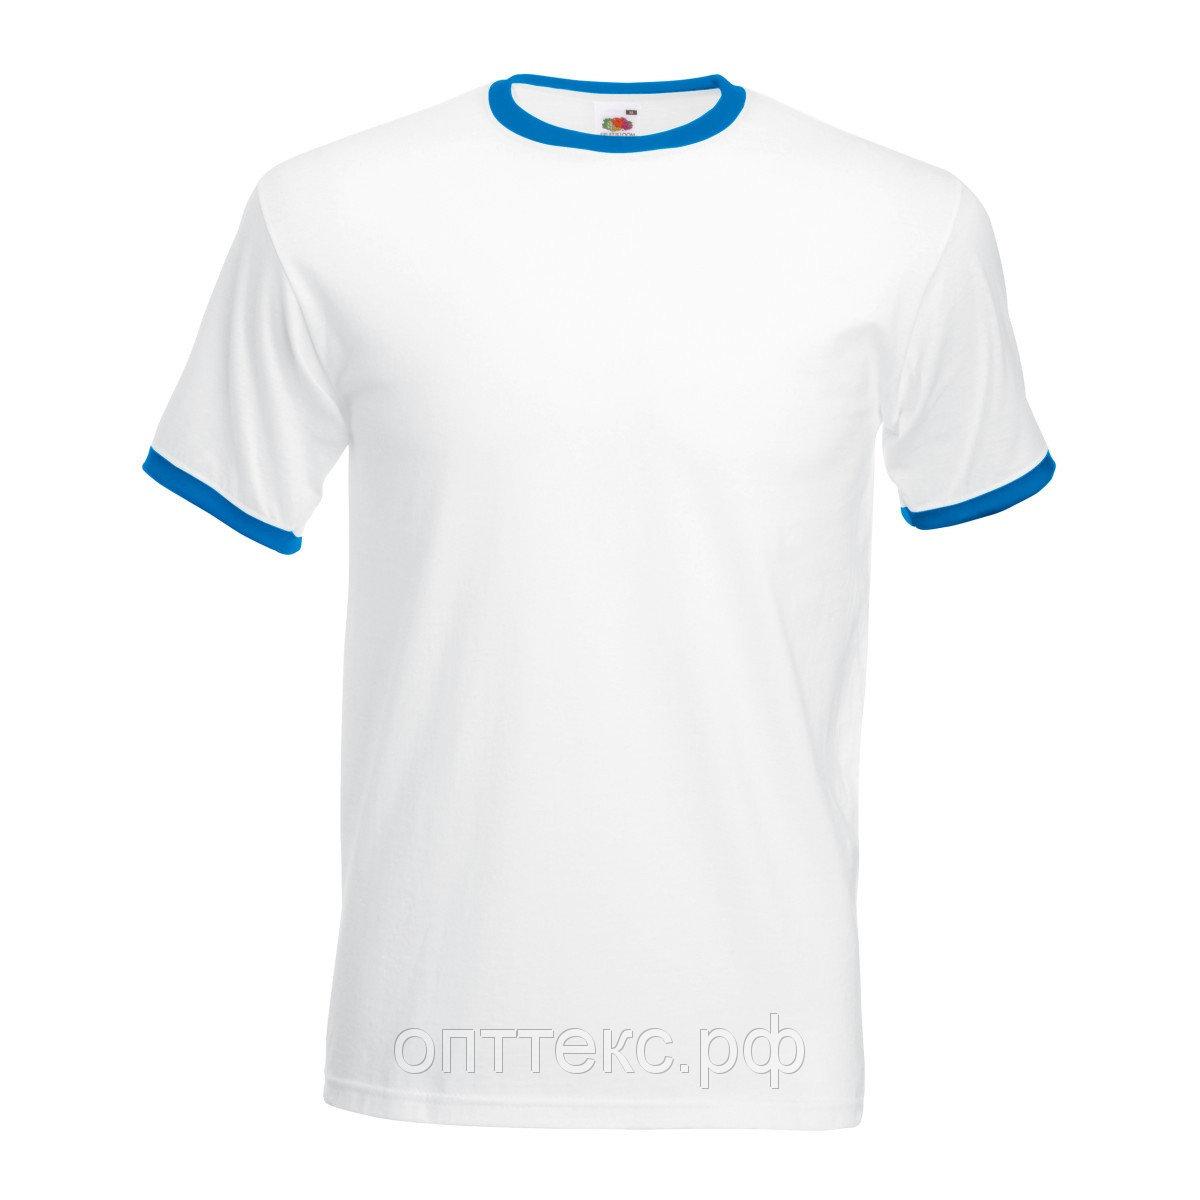 Футболка для сублимации мужская с синим кантом (сэндвич 185 гр)